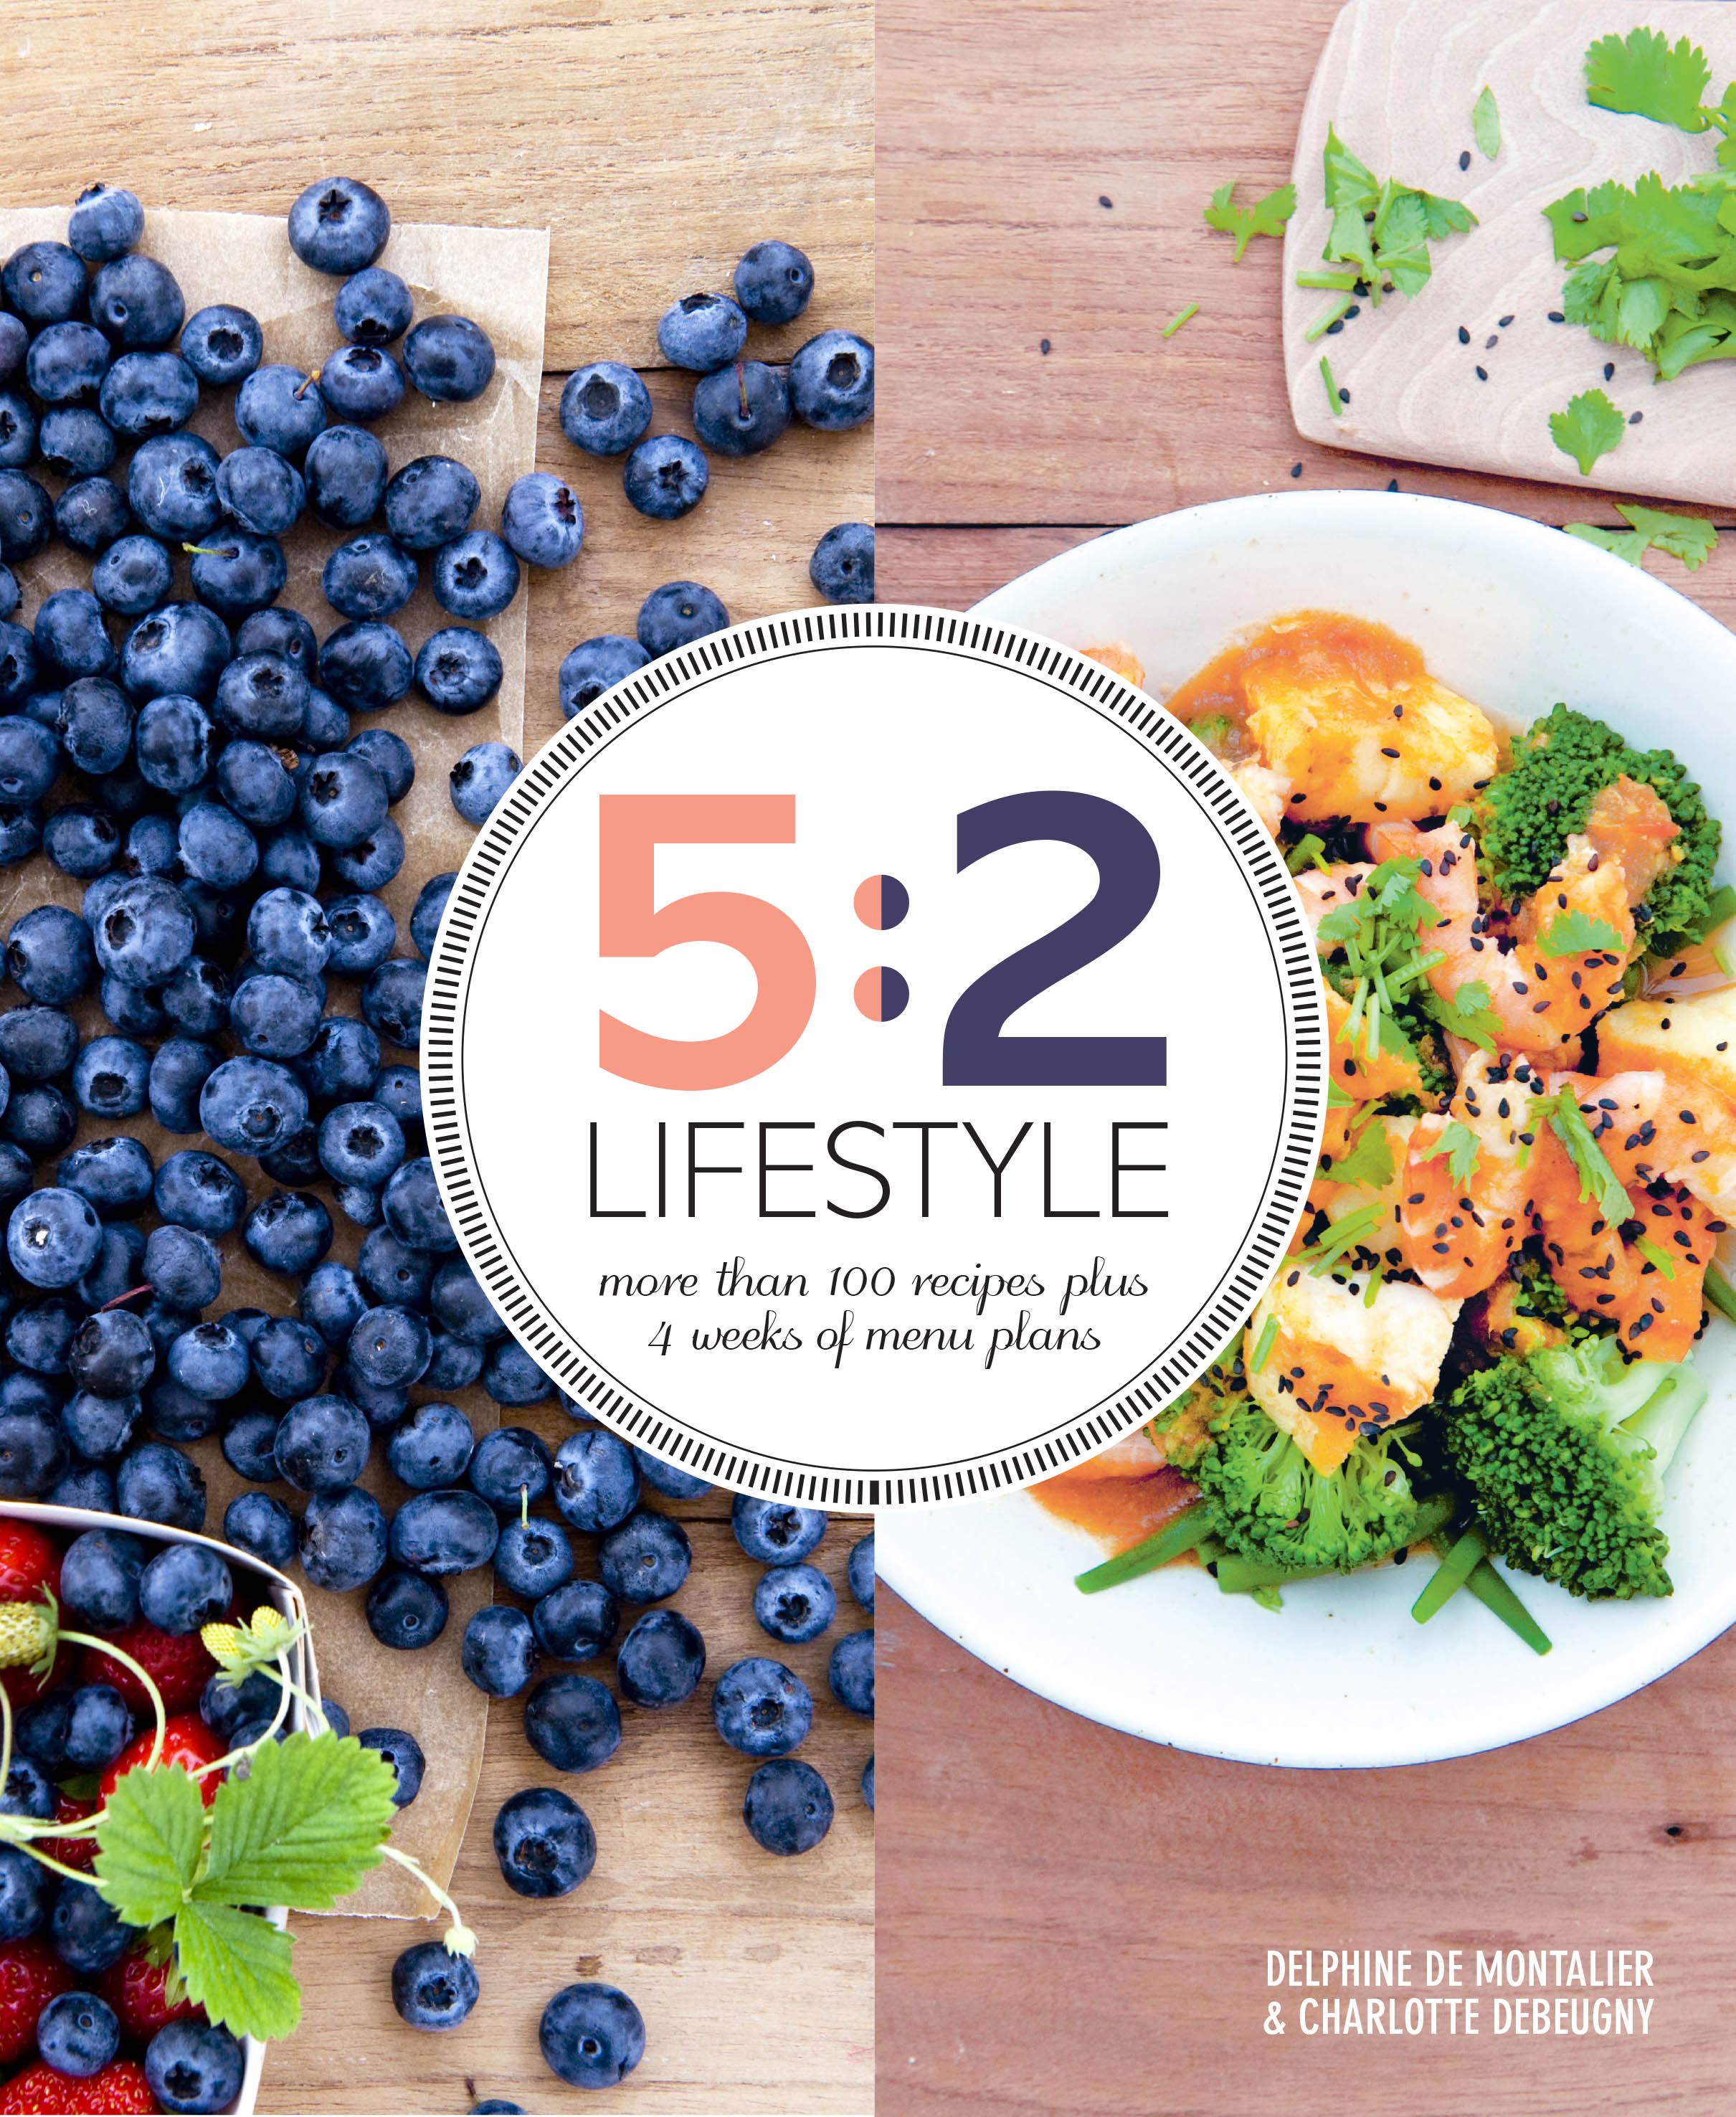 French 5:2 diet